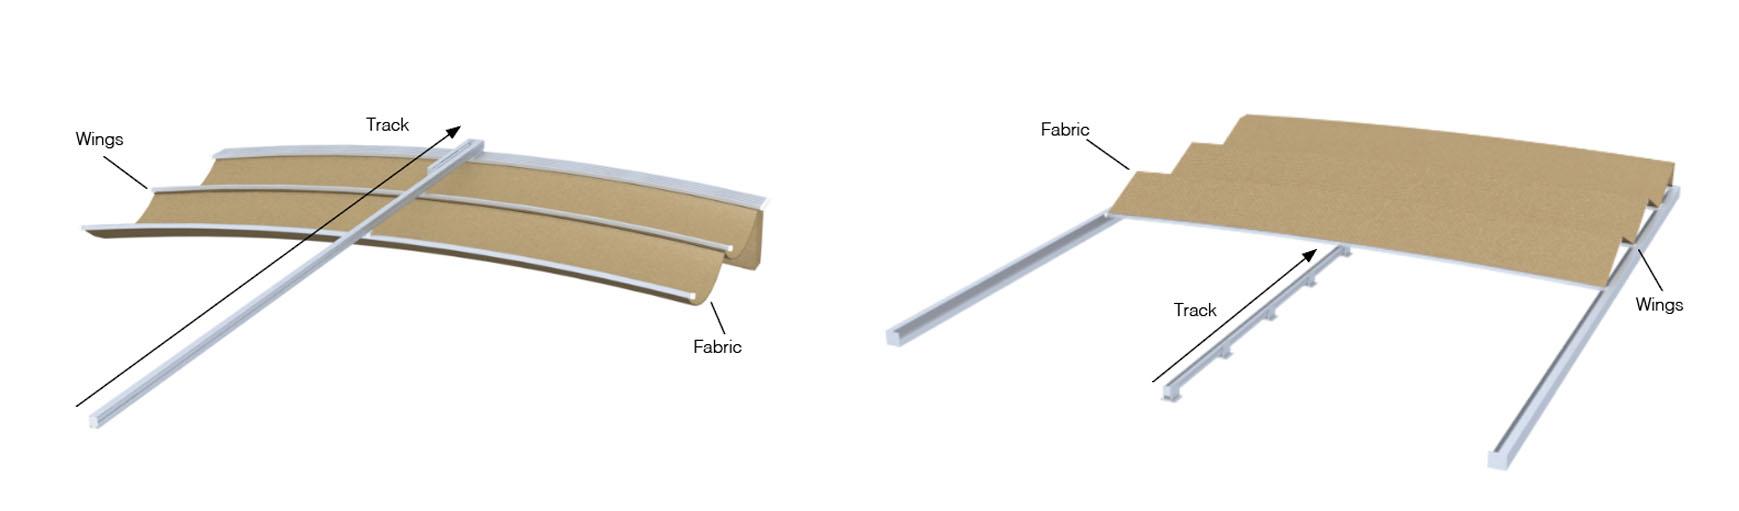 retractable canopy vs retractable roof